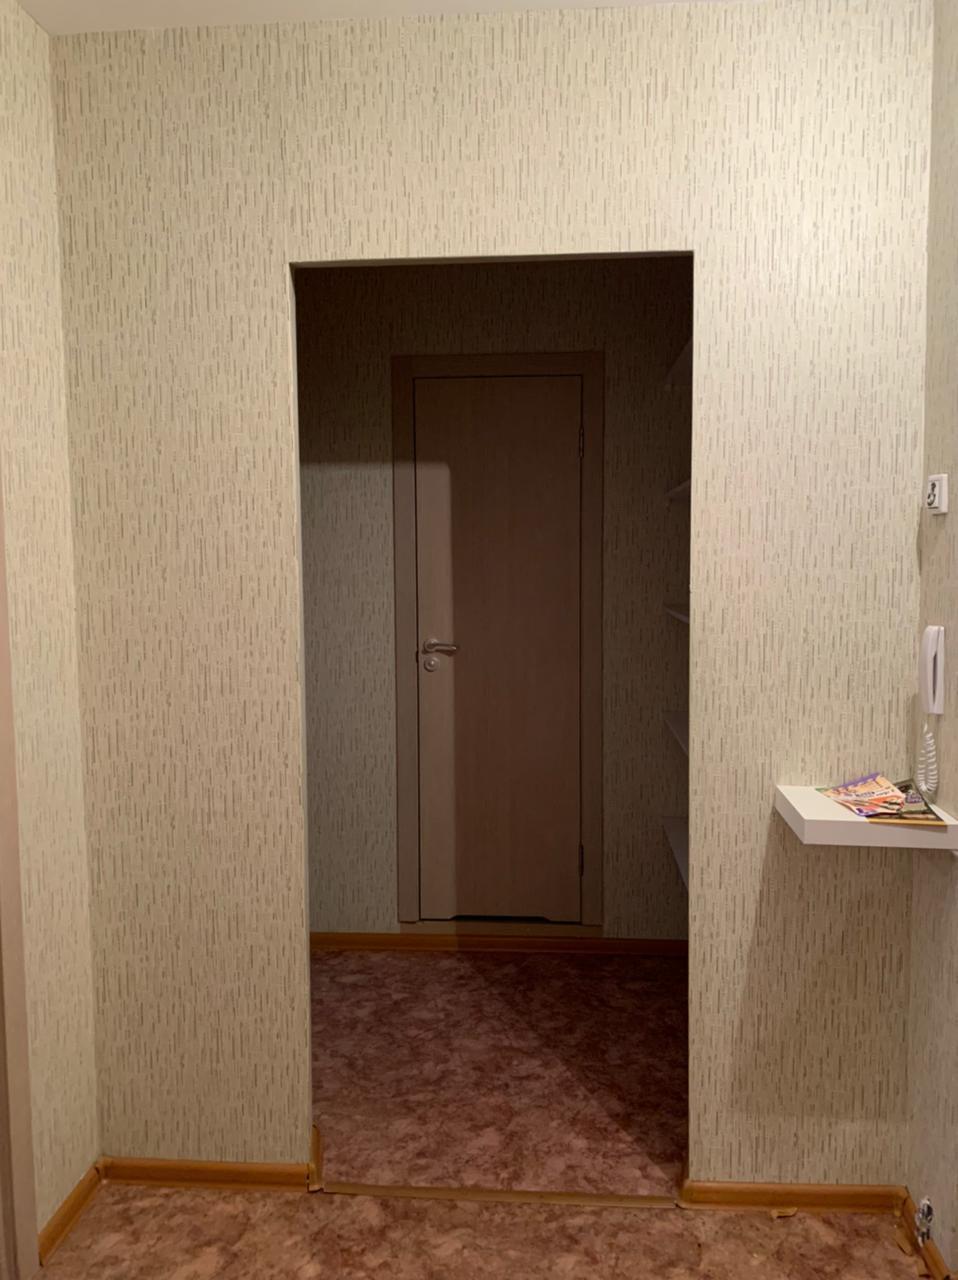 2к квартира Караульная улица, 44 | 19000 | аренда в Красноярске фото 7